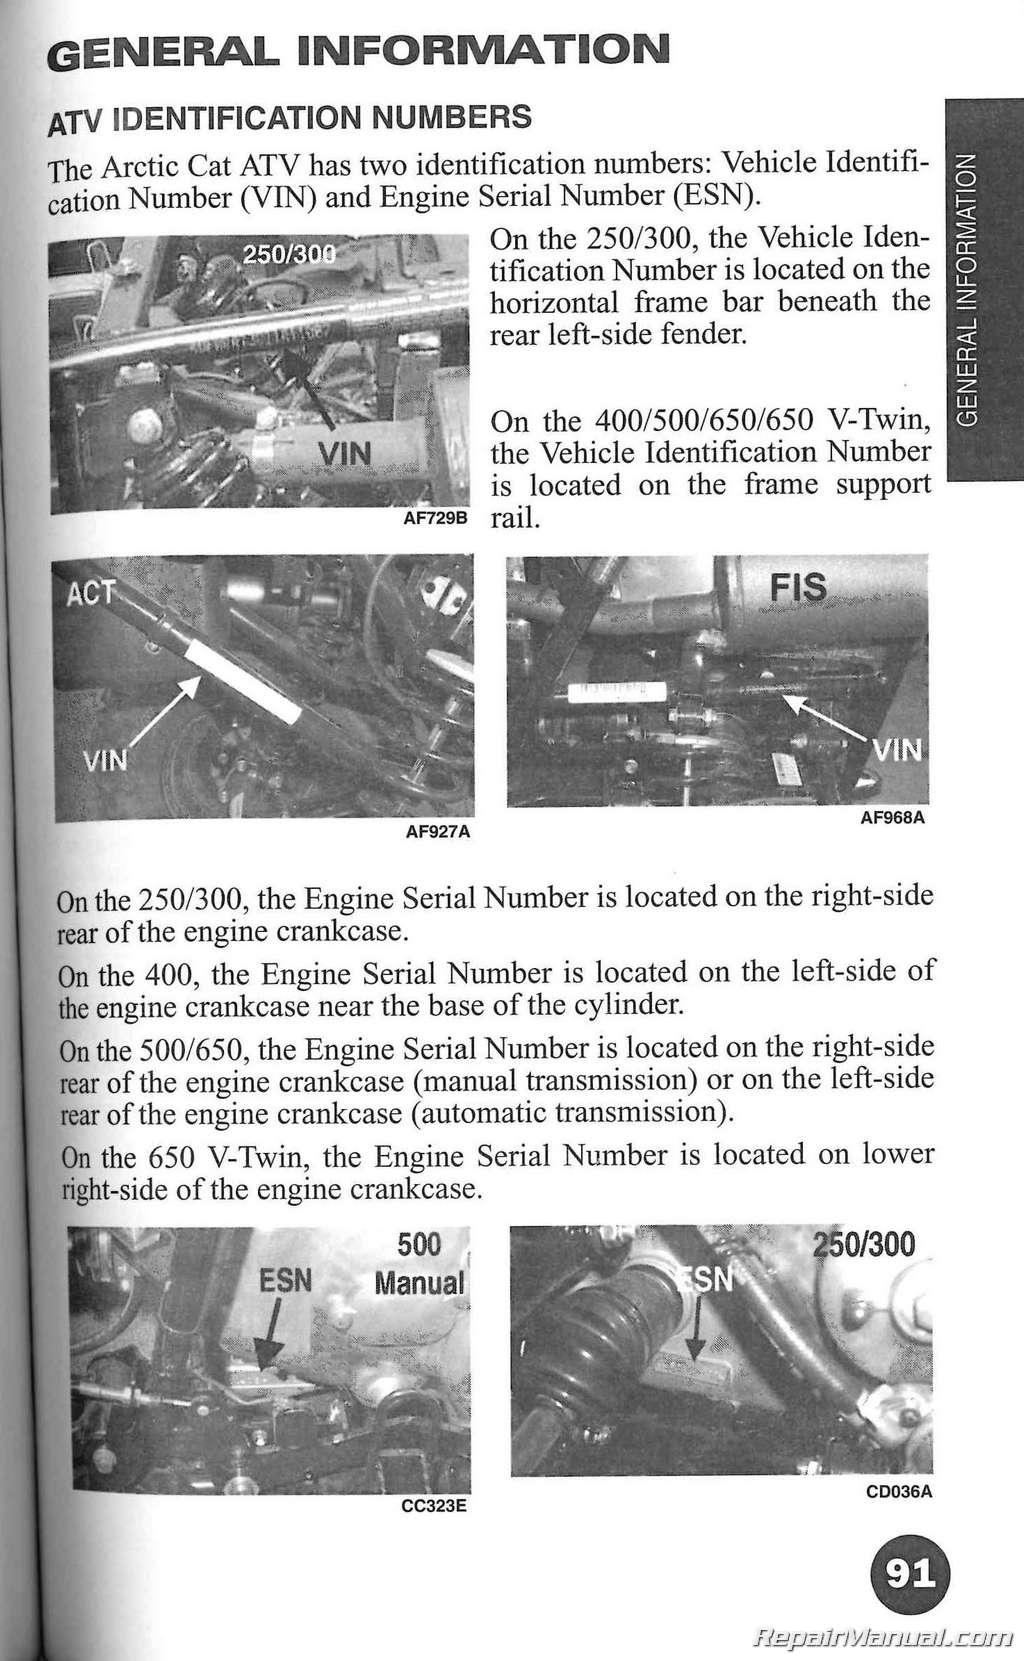 2005 Arctic Cat ATV Owners Manual